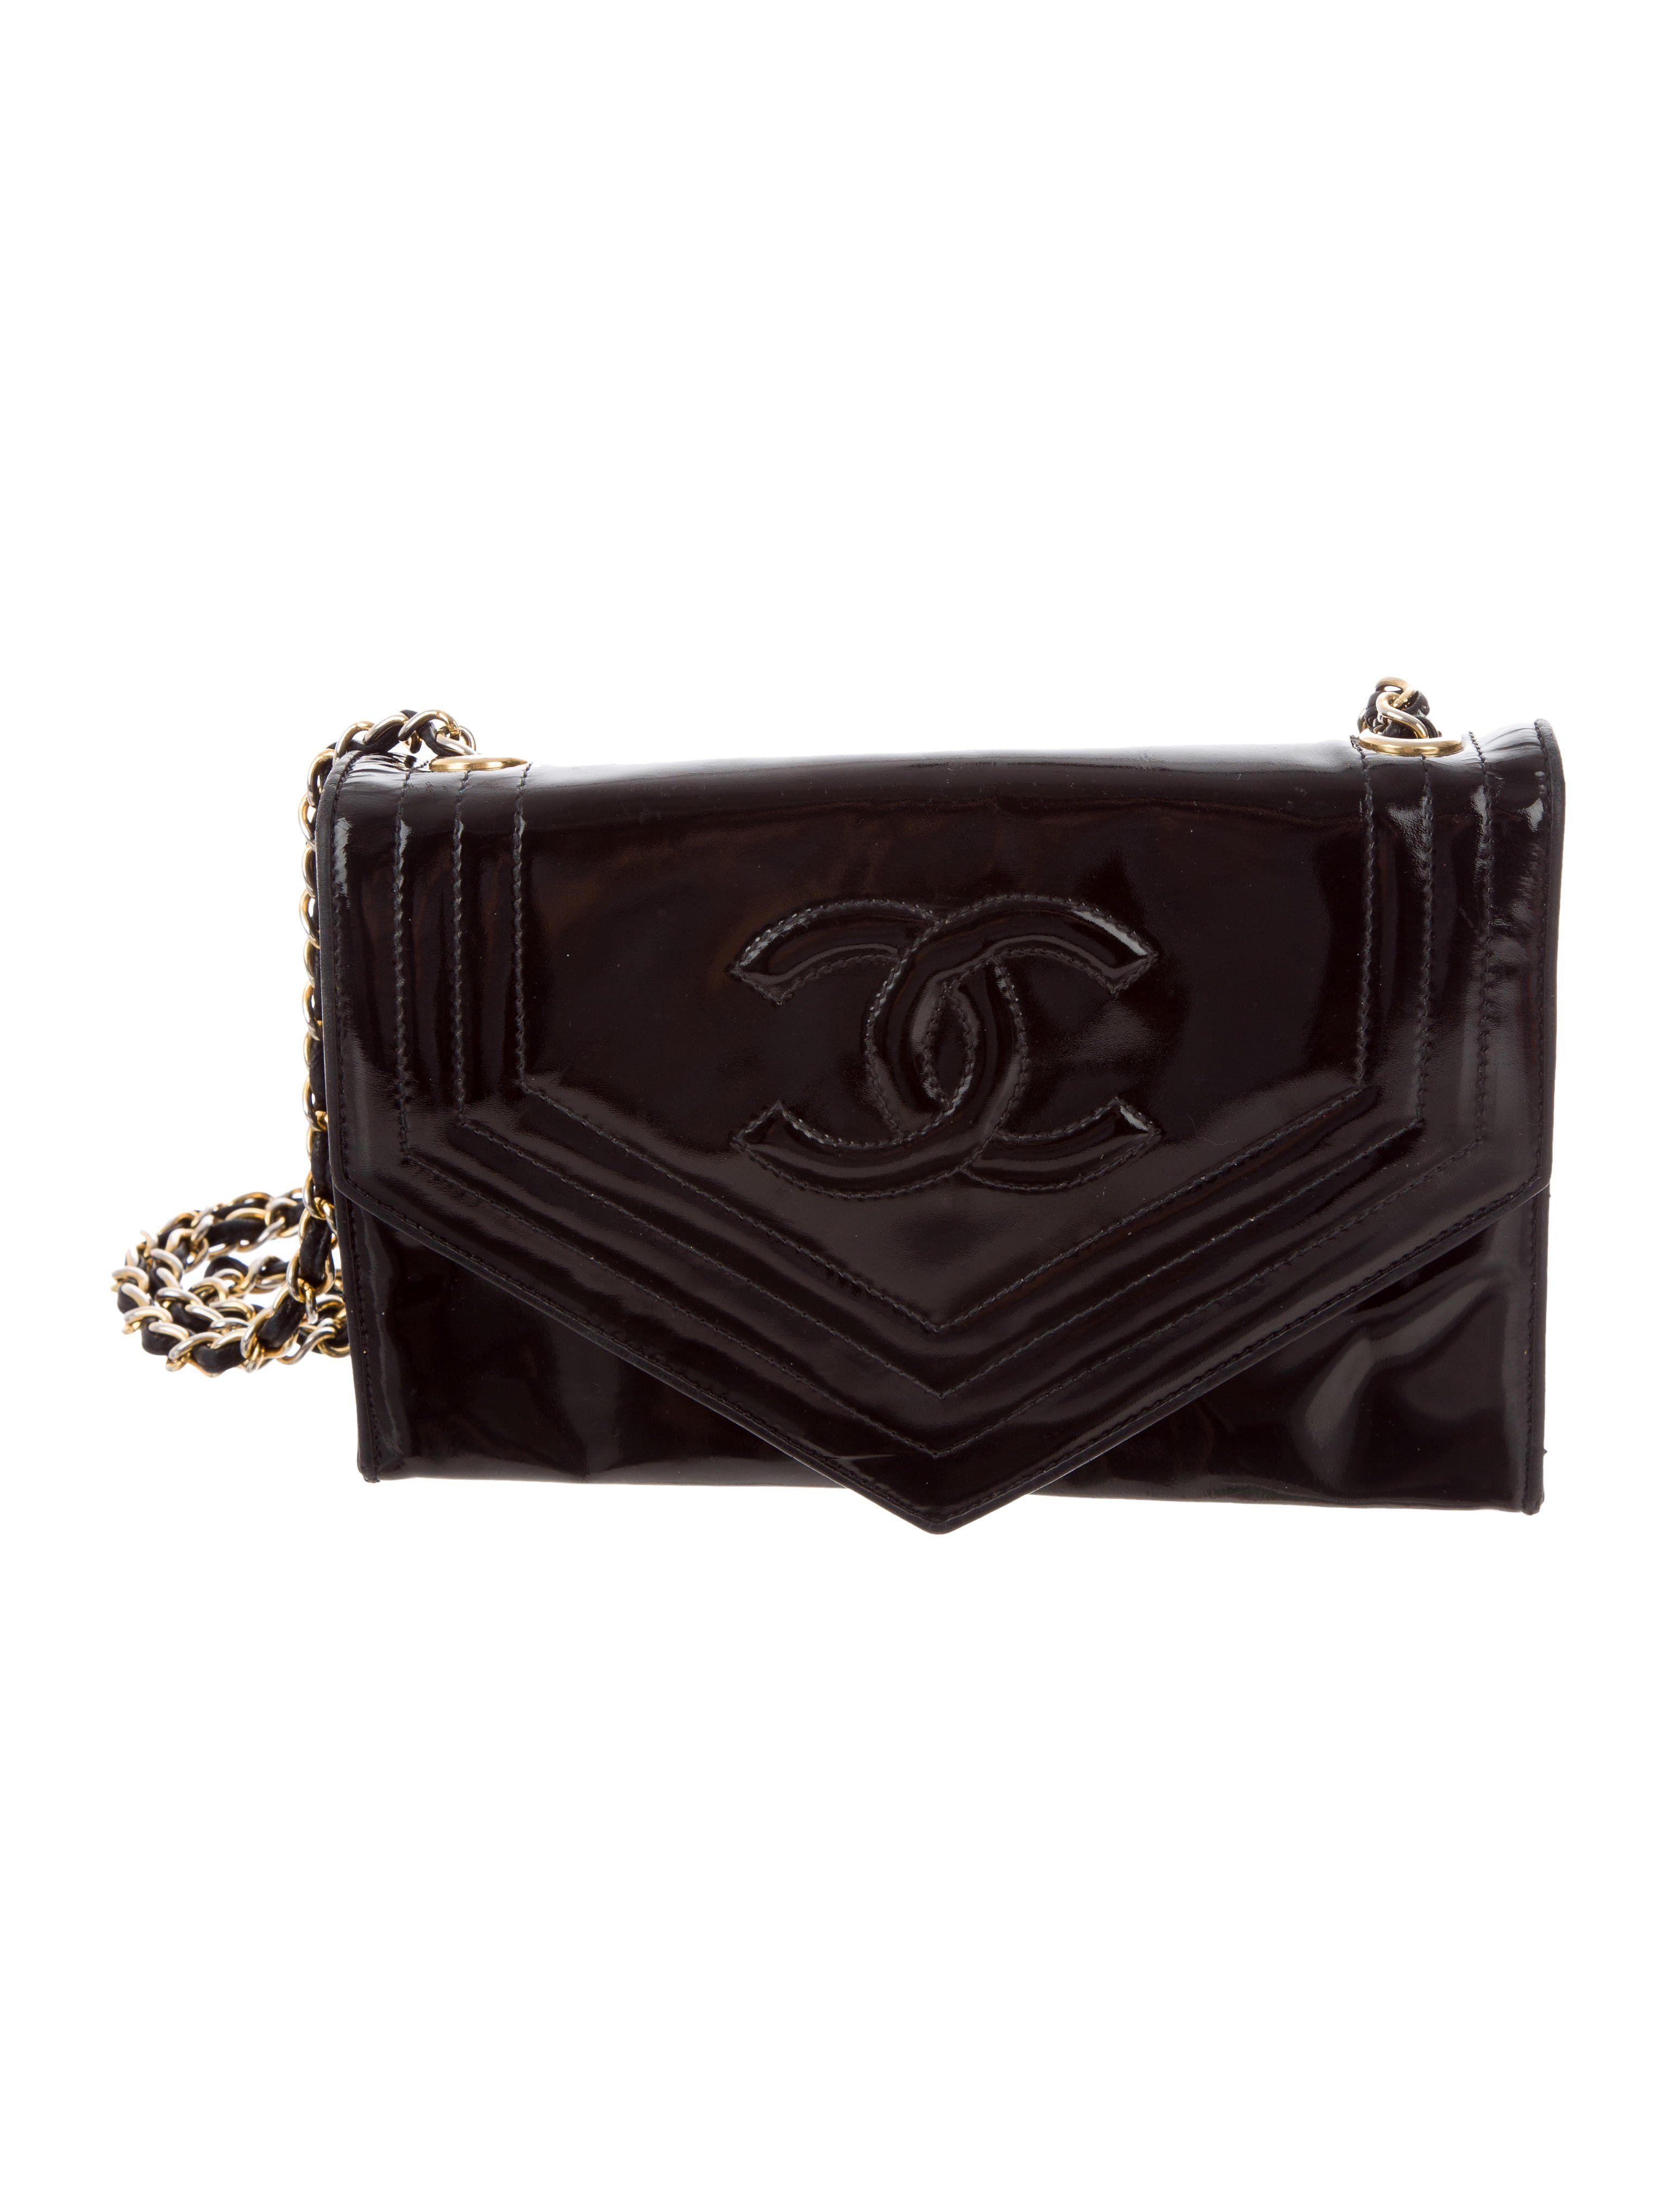 Chanel Vintage Envelope Flap Bag Handbags Cha217754 The Realreal Designer Crossbody Bags Flap Bag Bags